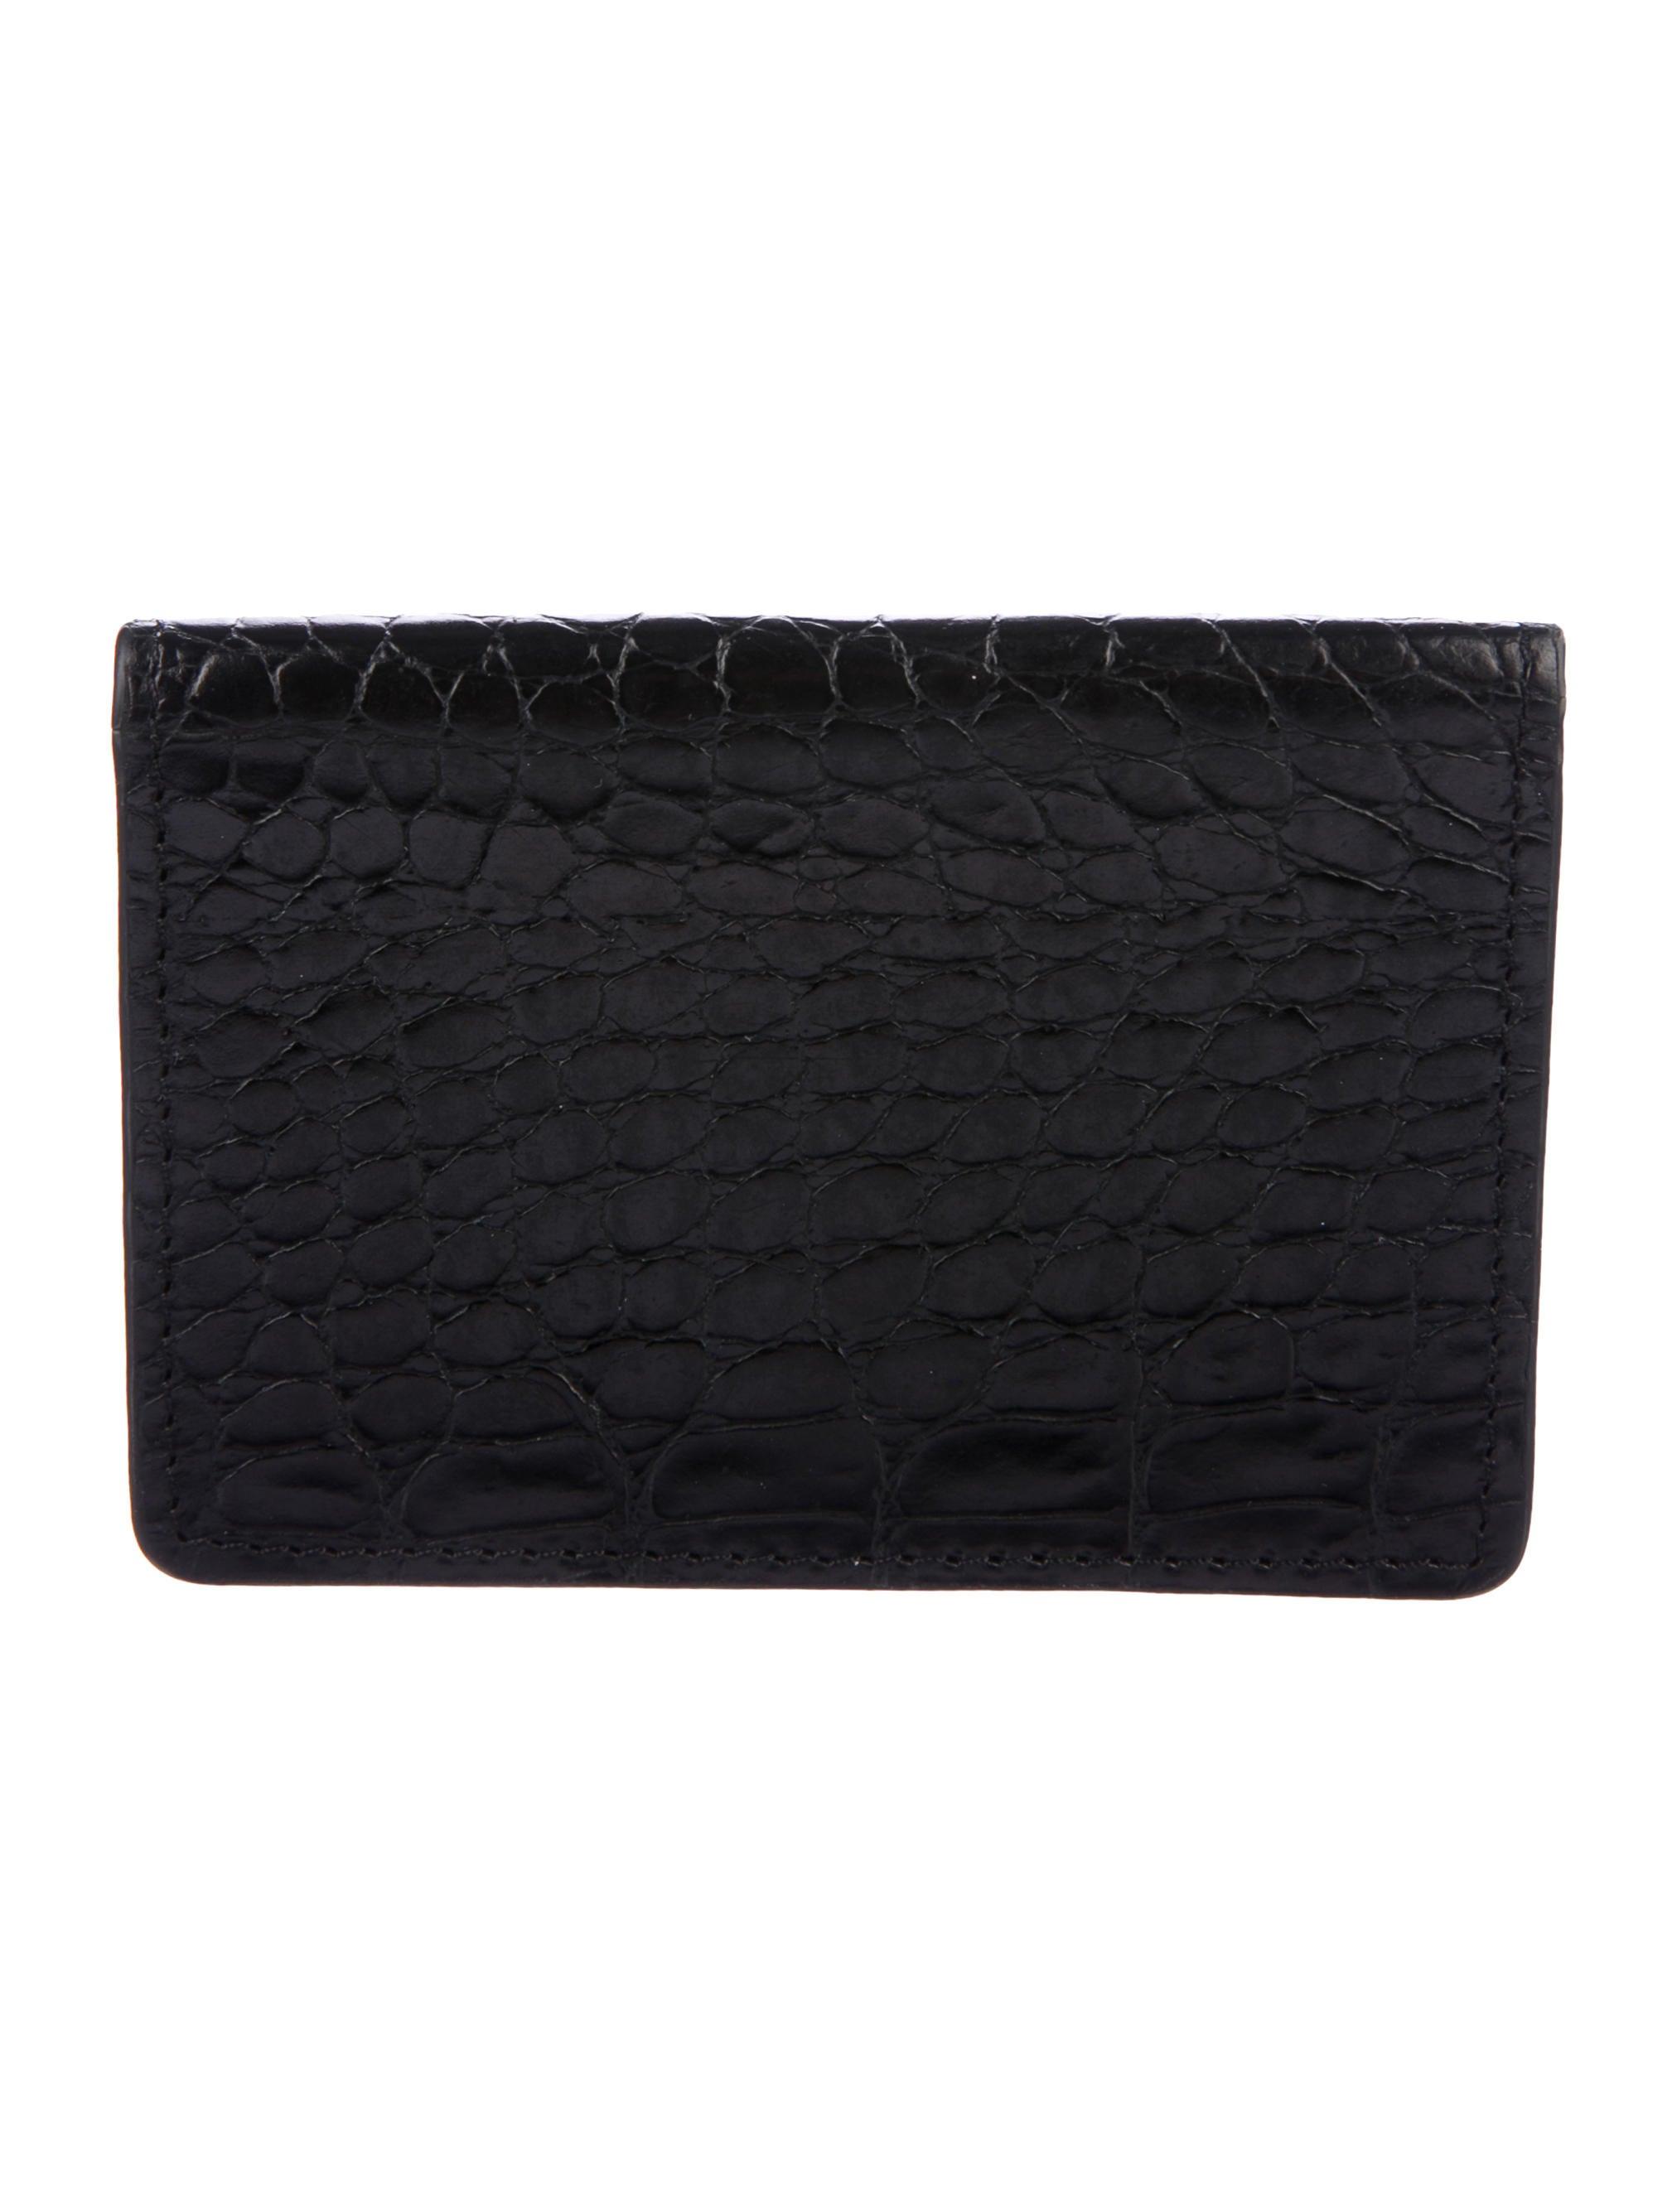 Marc jacobs embossed business cardholder accessories mar57369 embossed business cardholder colourmoves